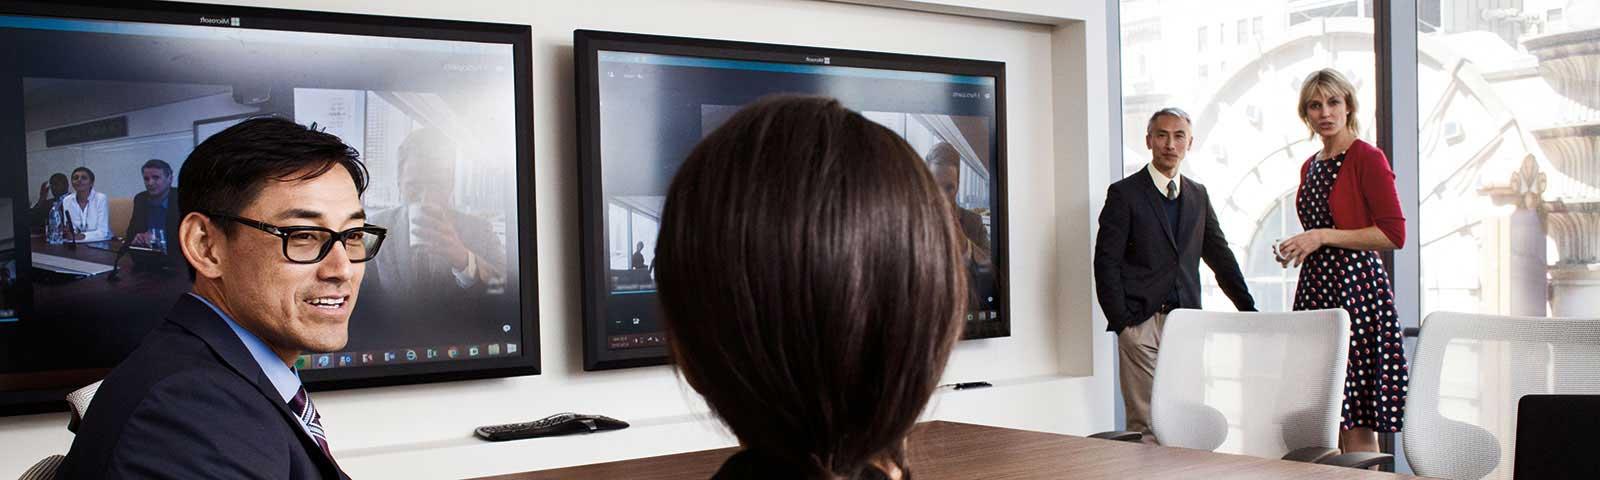 Colleagues having meeting through Skype